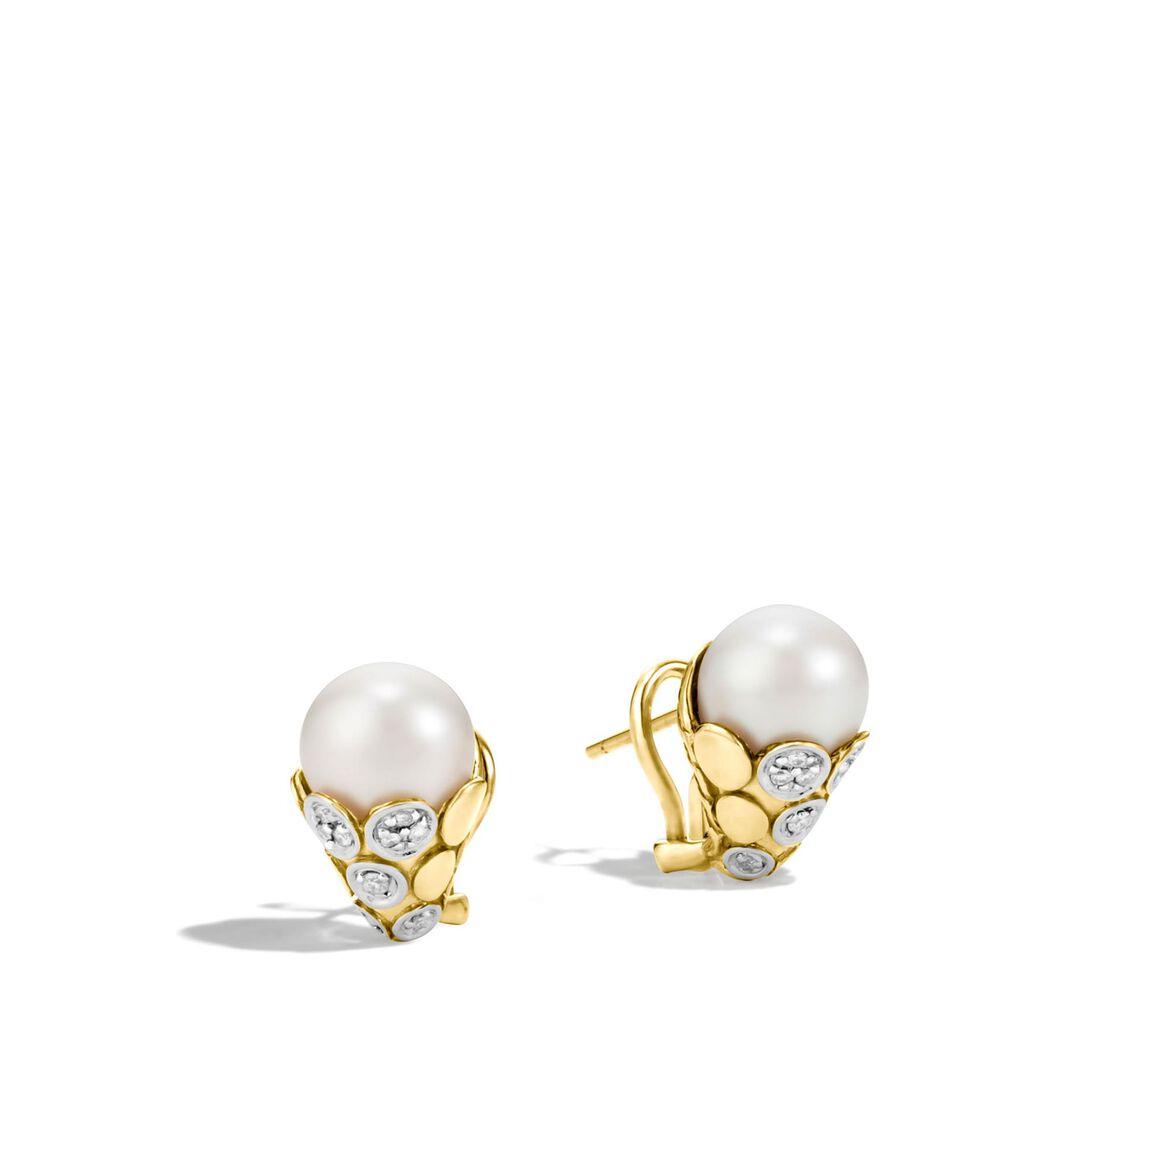 Dot Buddha Belly Earring in 18K Gold, 10MM Pearl, Diamonds